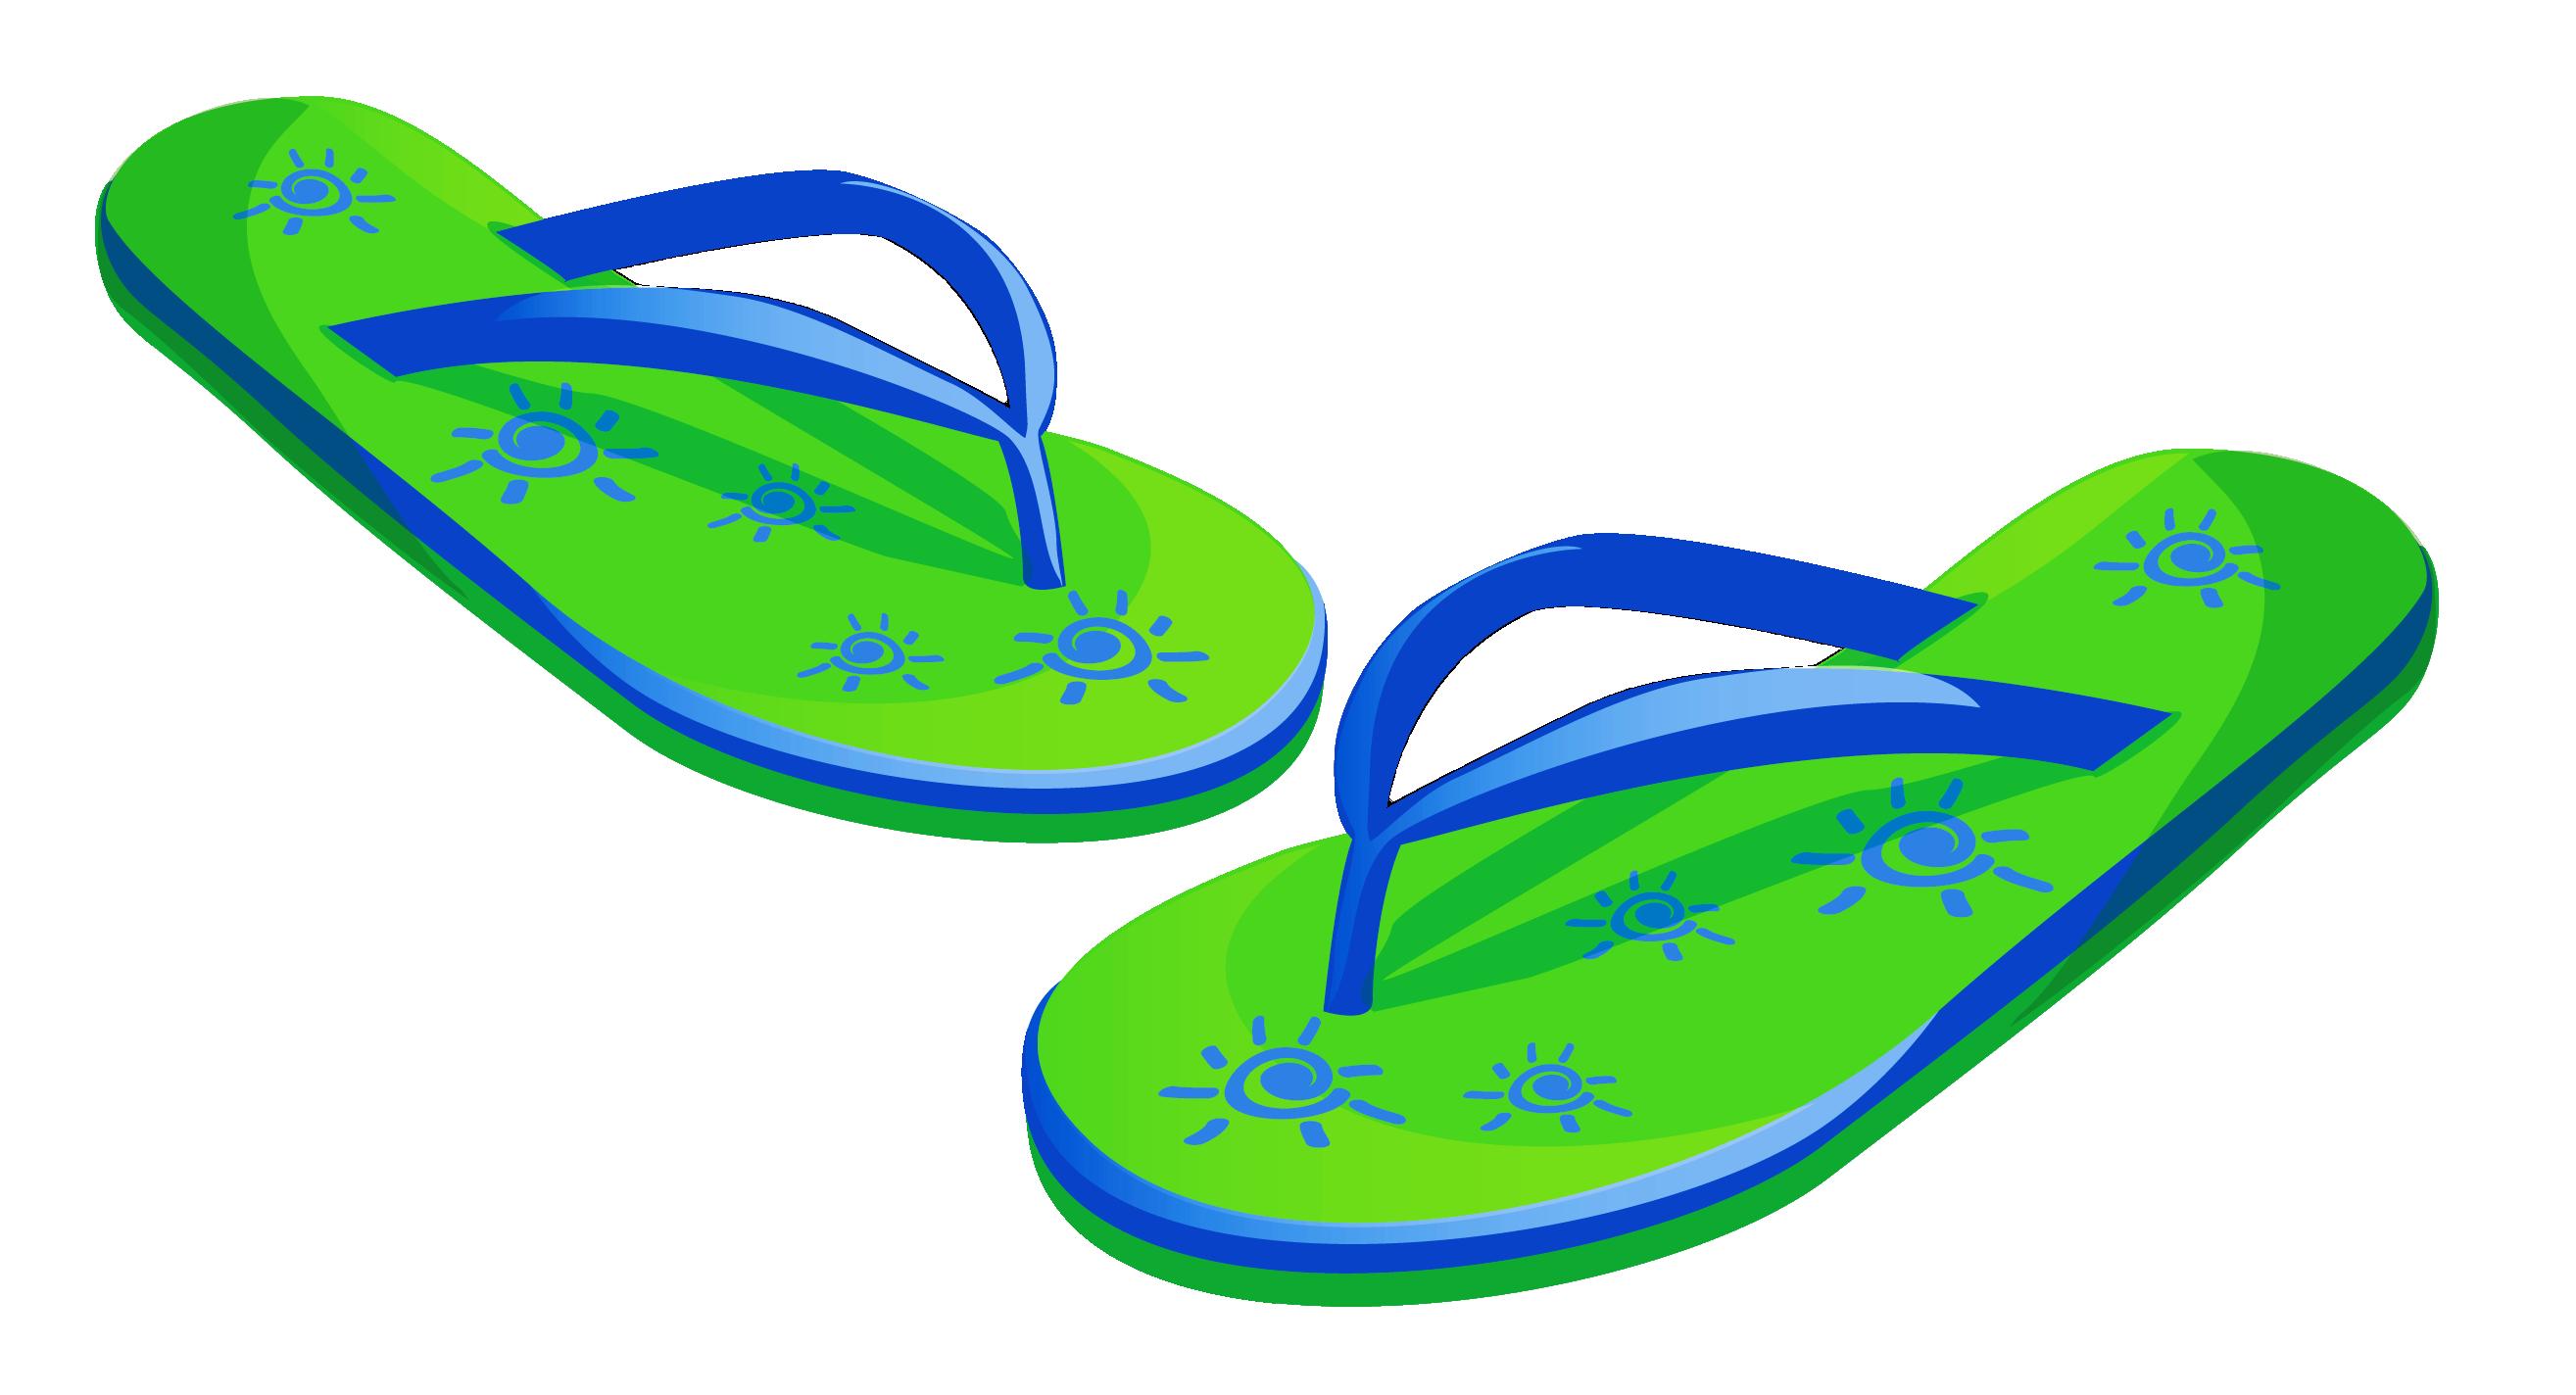 freeuse stock Flip flops clipart. Transparent green beach png.